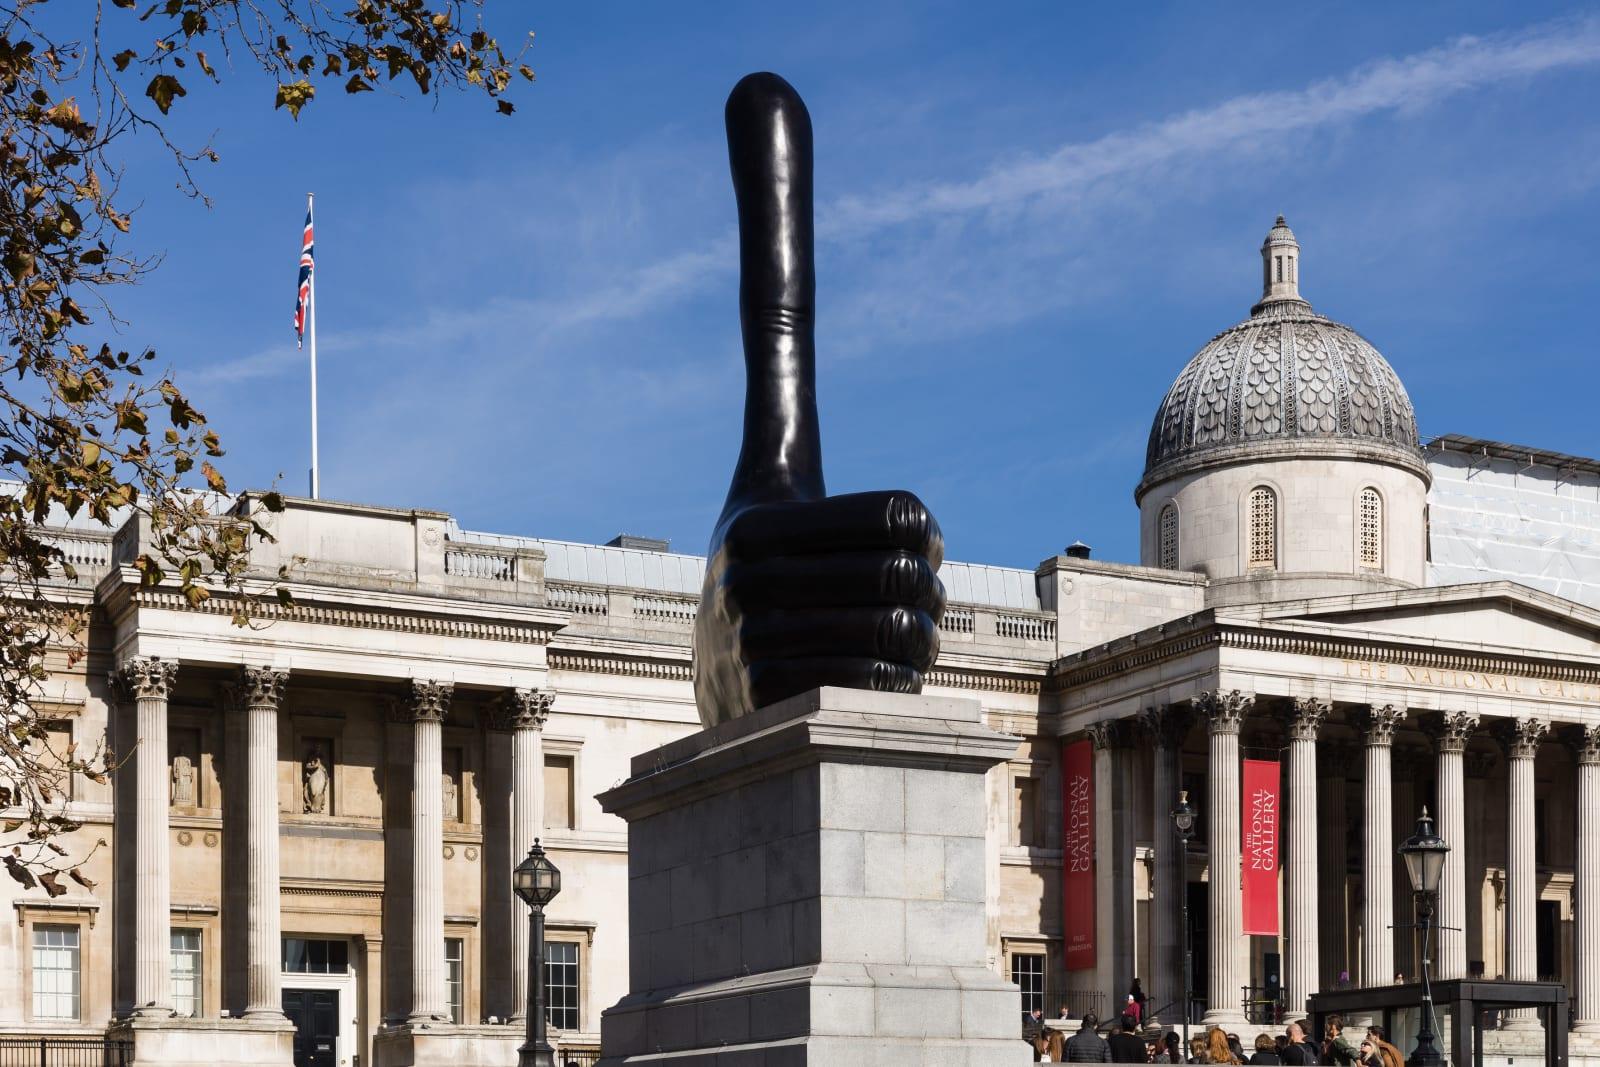 <p>Installation view: 'Really Good', Fourth Plinth Commission, Trafalgar Square, London (2016).</p>